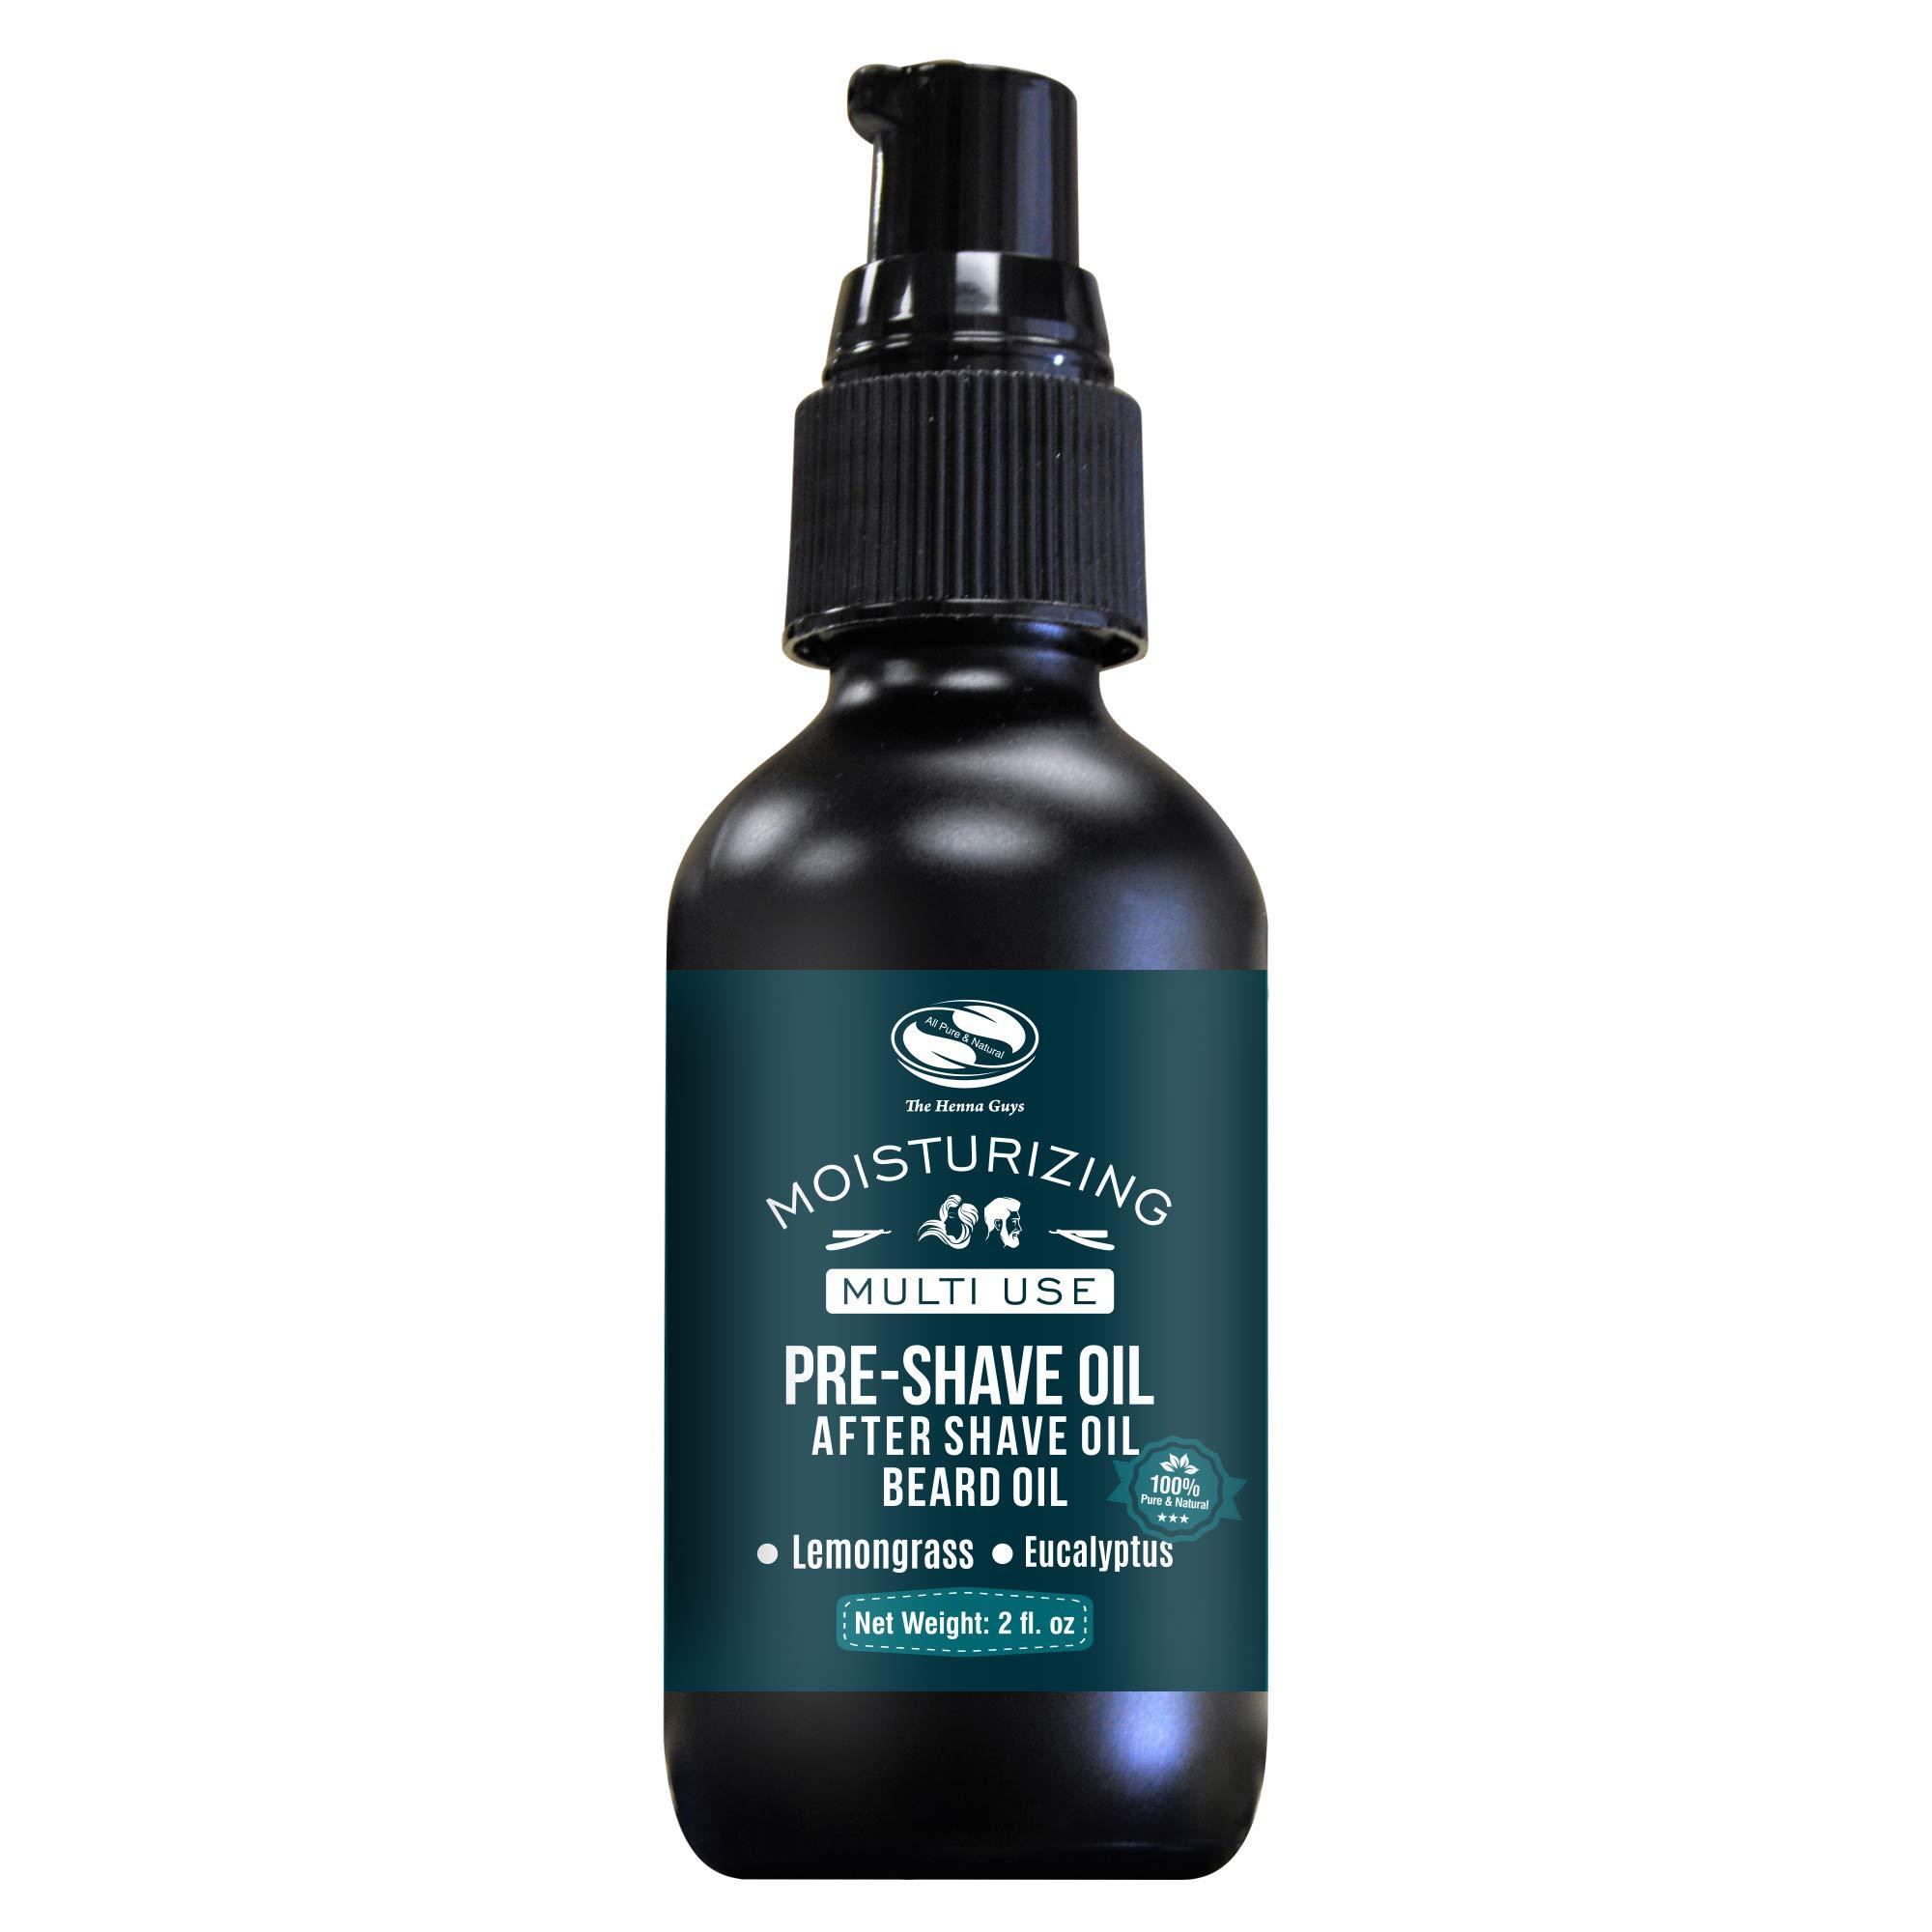 2 fl. Oz, Lemongrass & Eucalyptus Pre Shave Oil for Men, Premium Pre Shave Oil, Excellent Shaving oil for Men with Sensitive Skin, Prepares for a burns free Shave, Works with Straight or Safety Razor